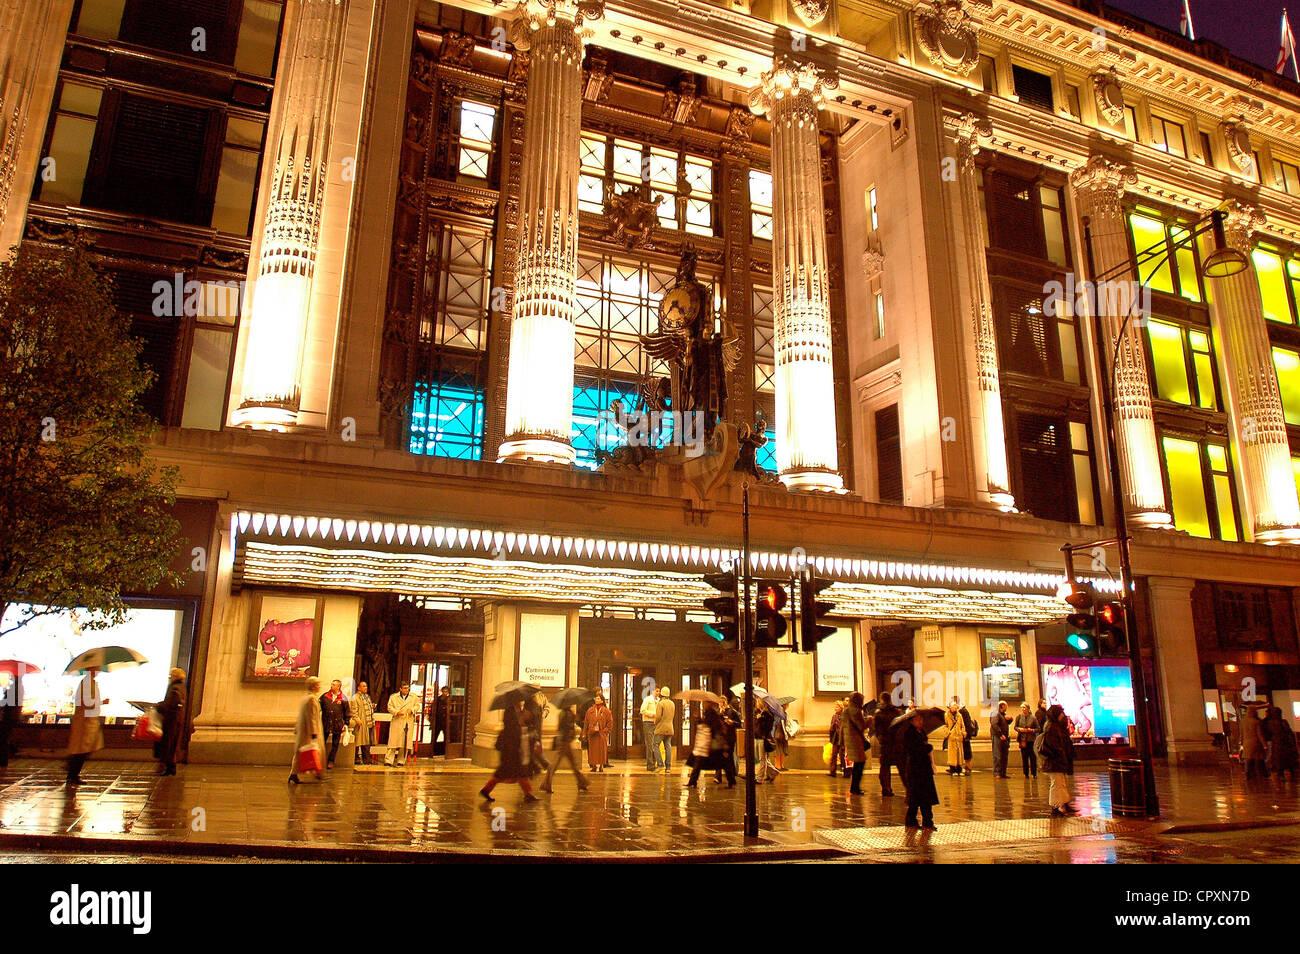 United Kingdom, London, Mayfair District, Selfridges shop - Stock Image